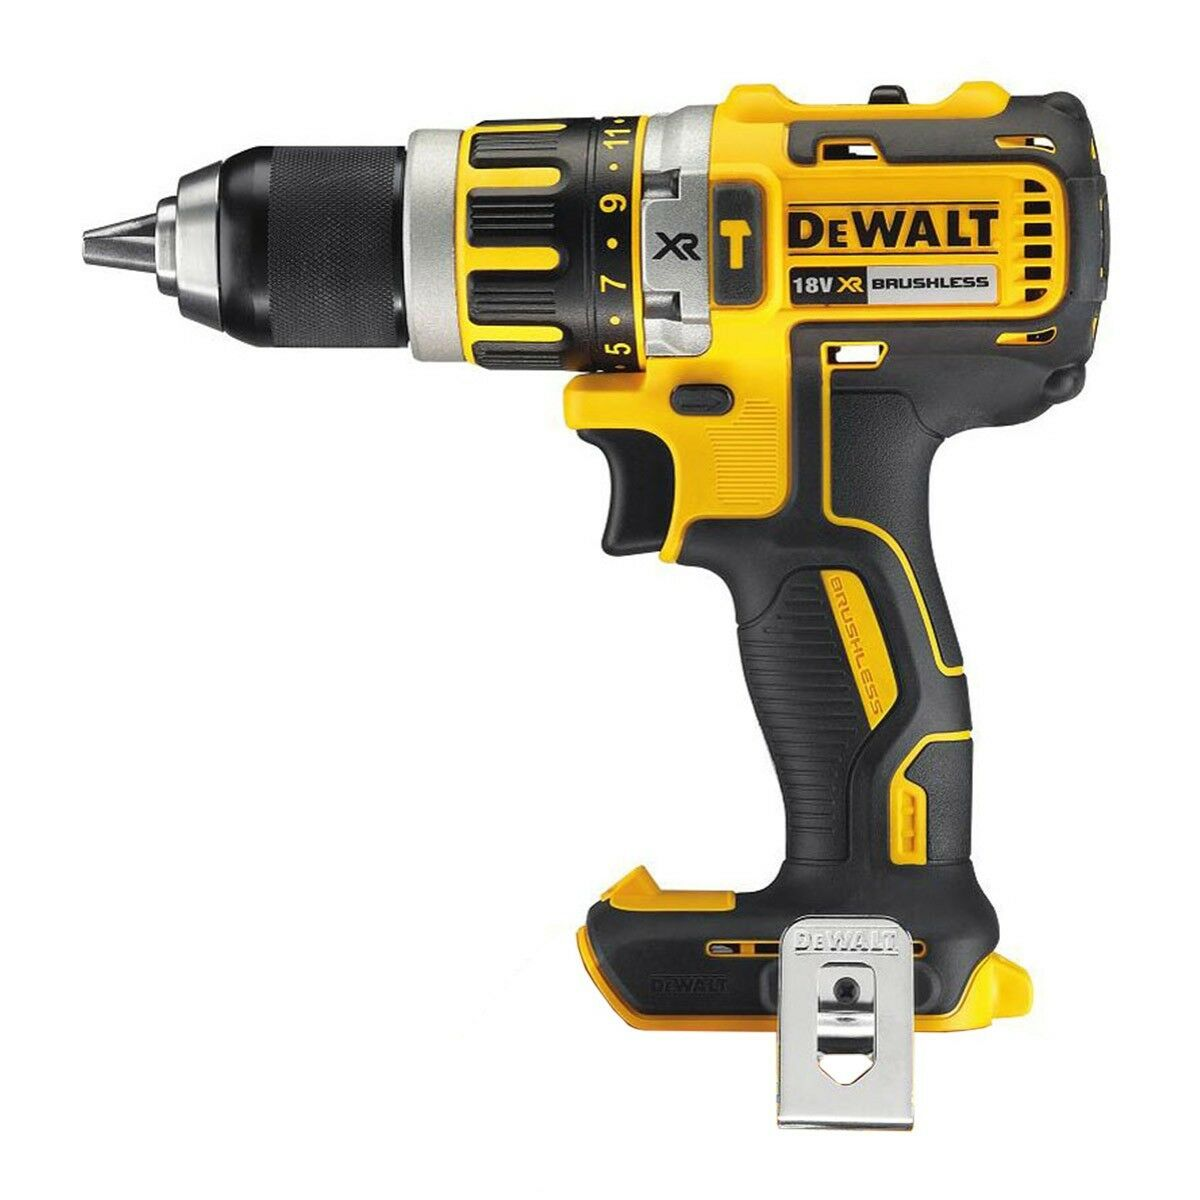 Dewalt DCD795 N,brushless, Dewalt-Fachhändler,18V ,Solo, m. Rechnung,dcd,737,795